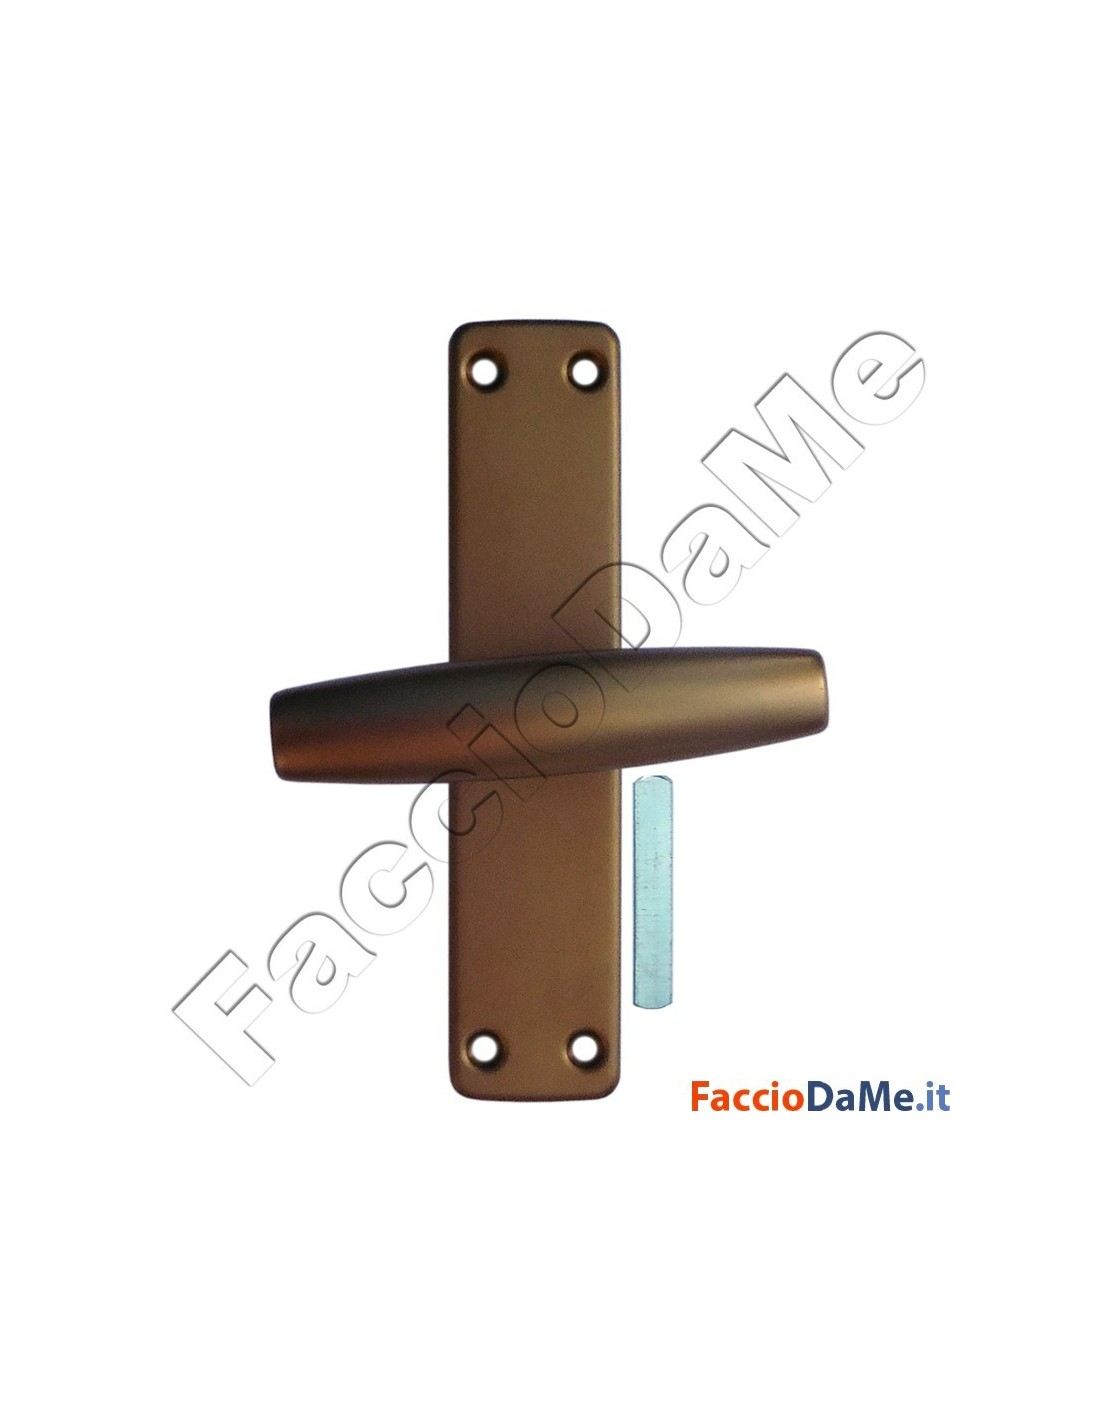 Maniglie cremonesi per porte e finestre serie standard in - Maniglie per finestre ...